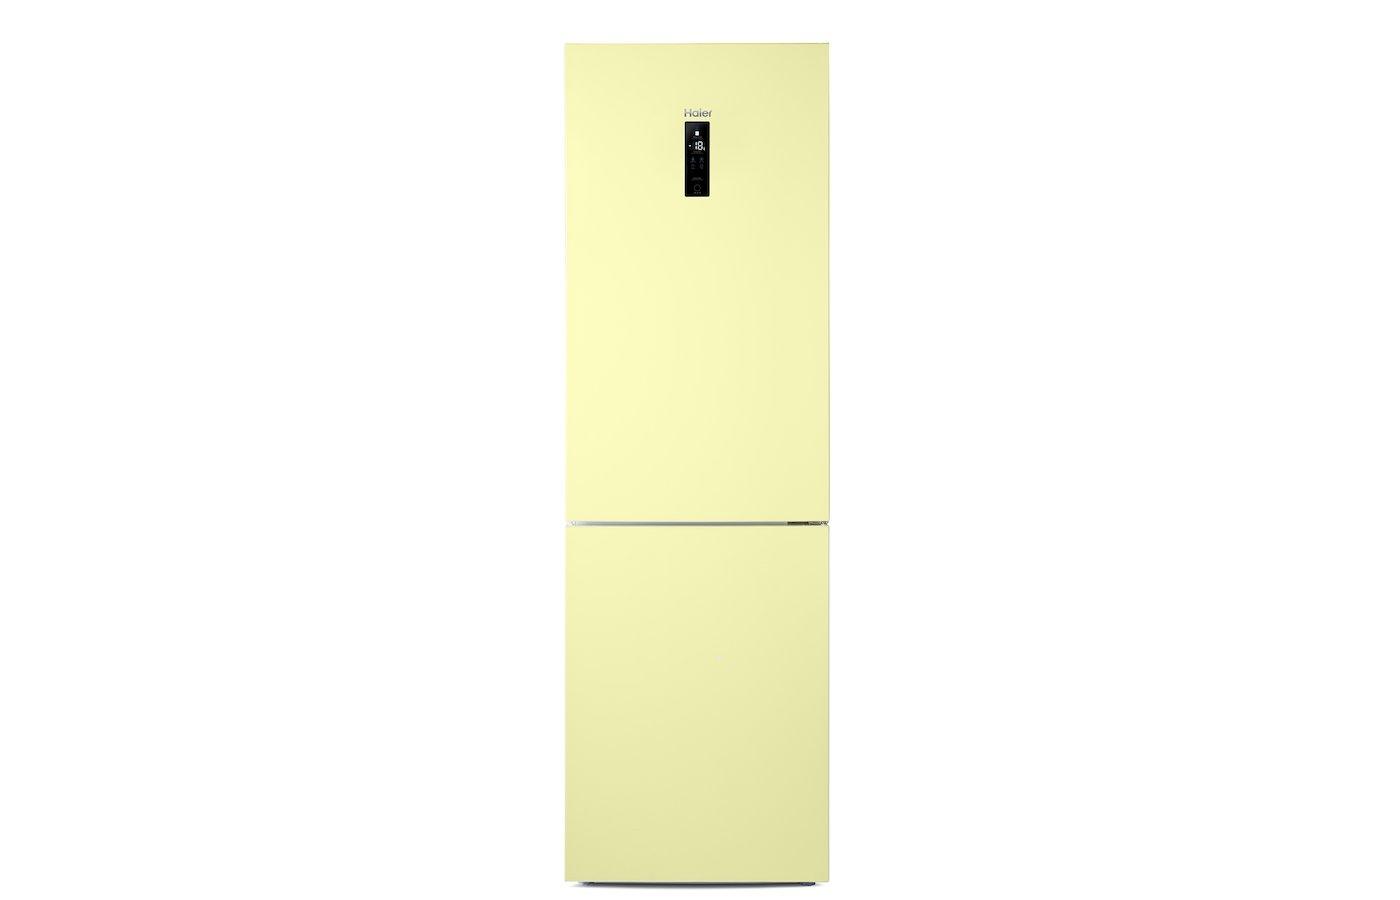 Холодильник HAIER C2 F 636 CCRG